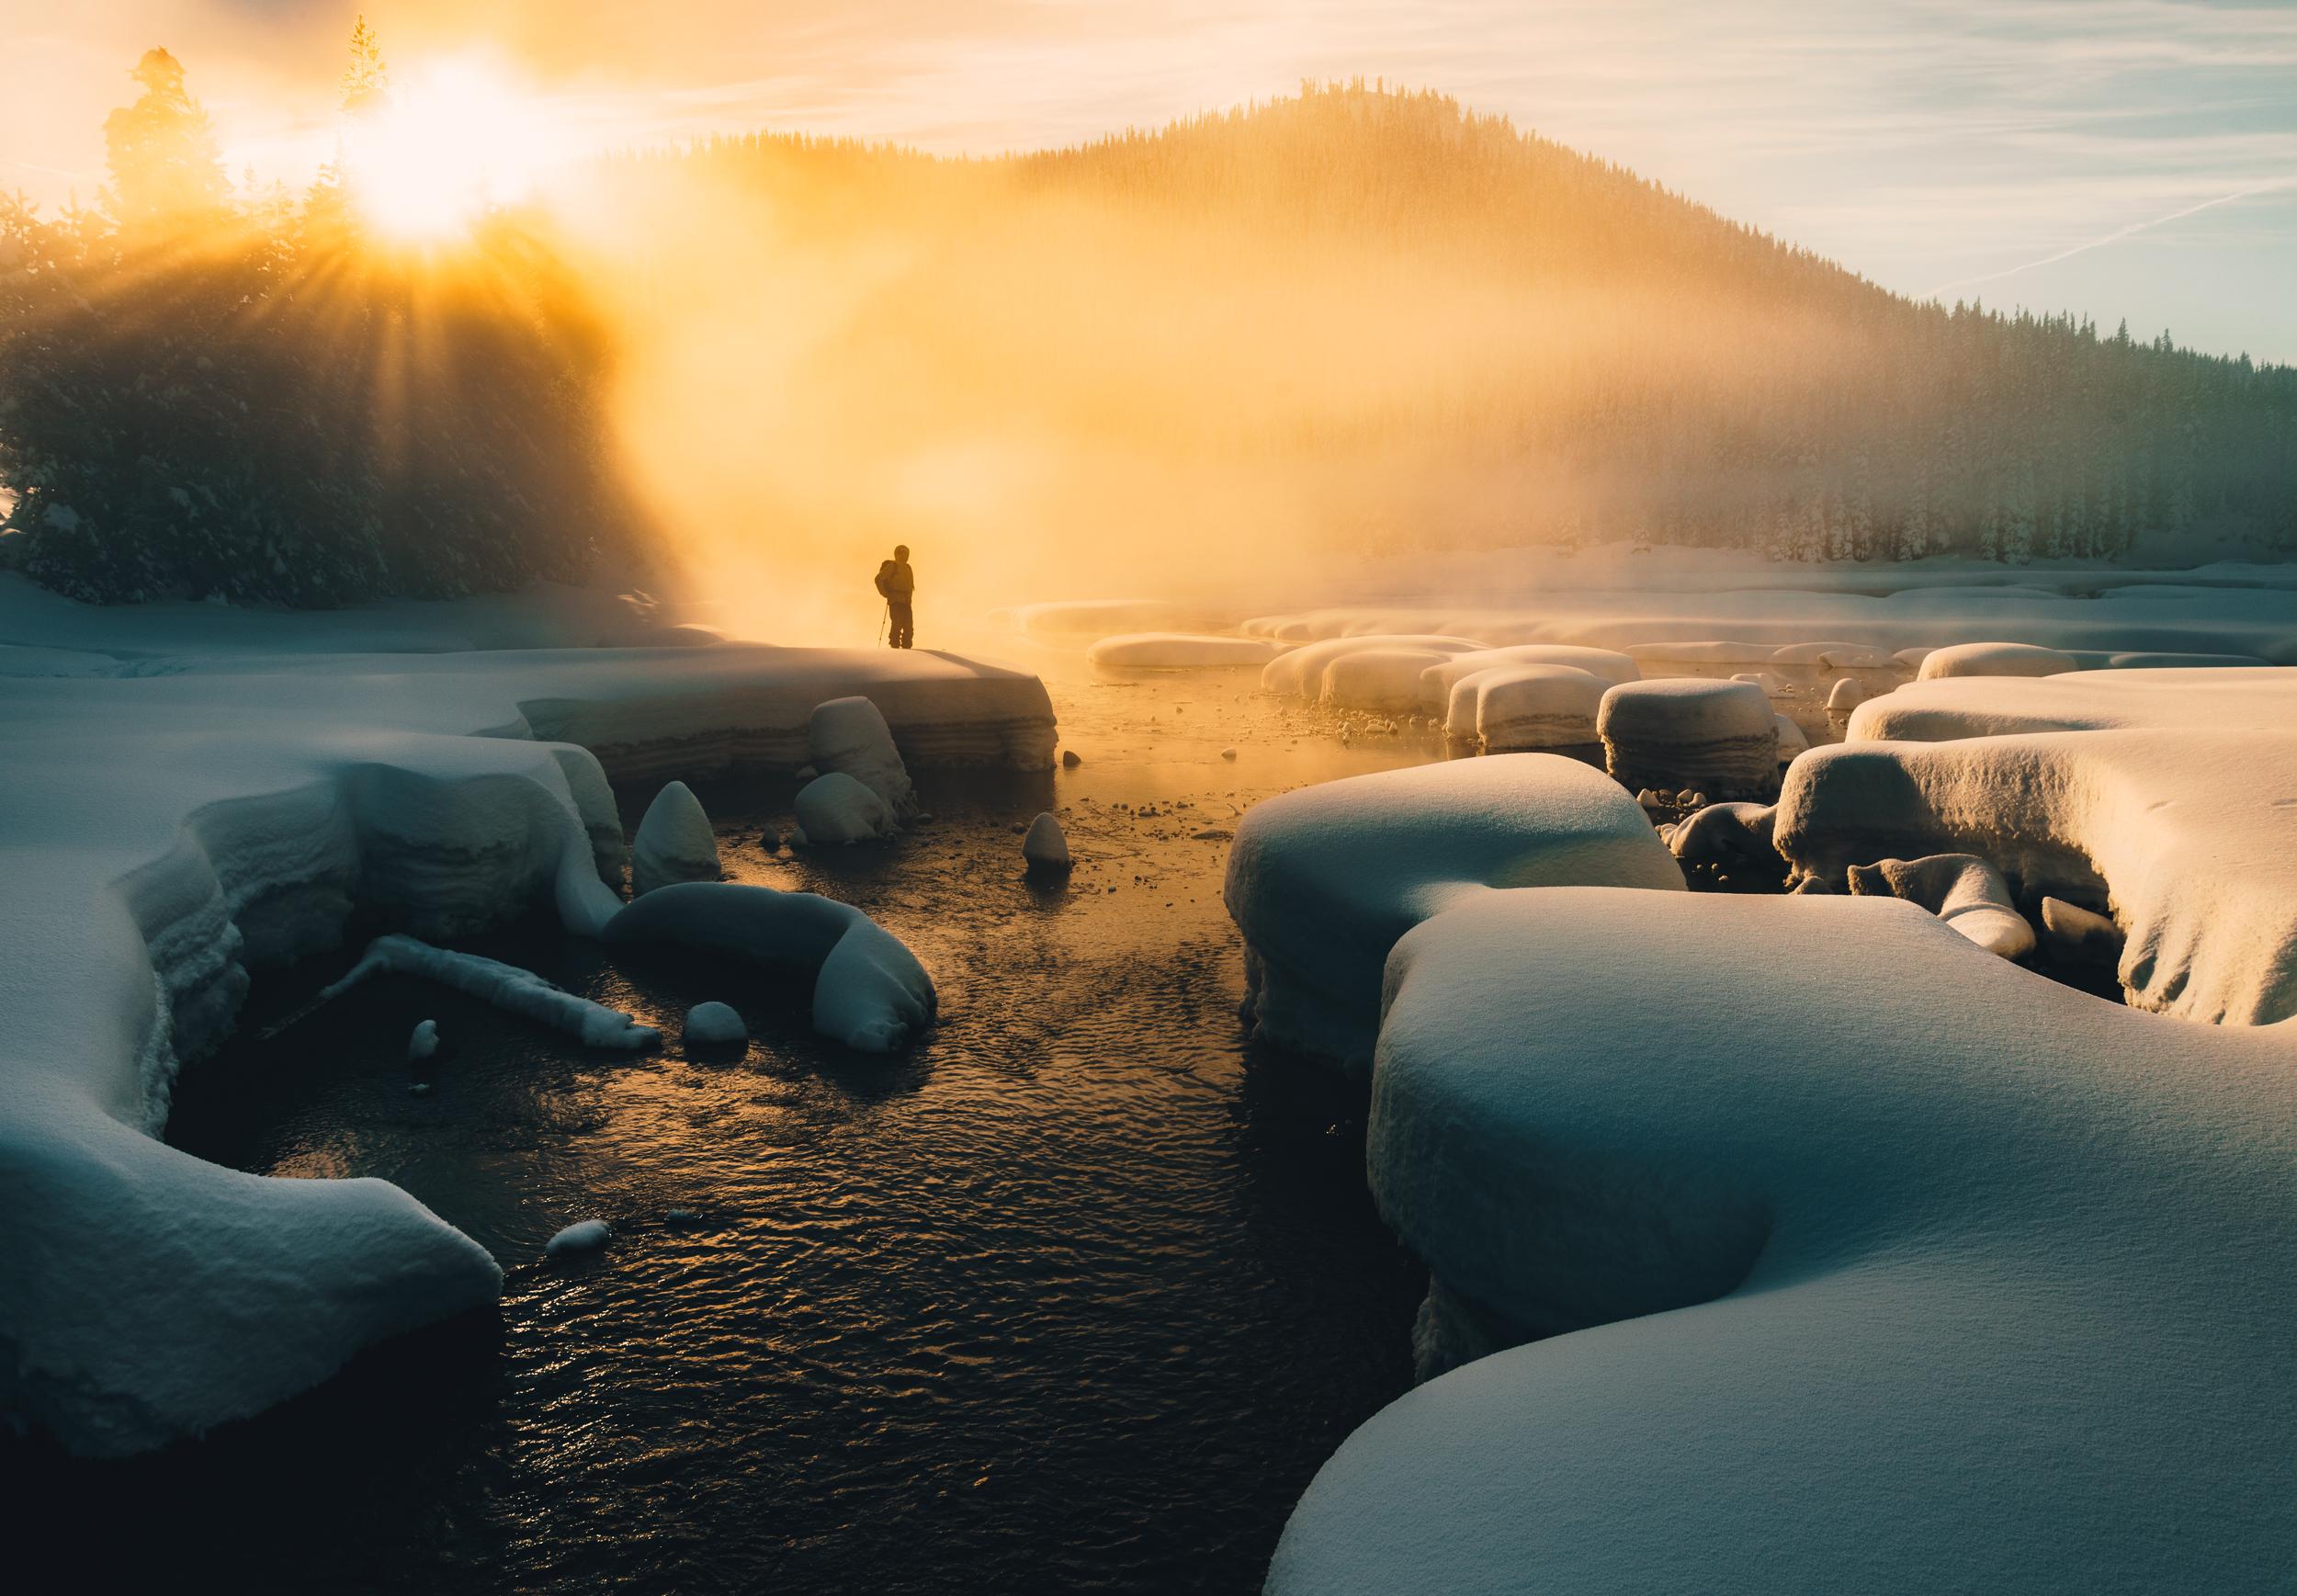 Devils-Lake-Sunrise-Steve-Aliberti.jpg